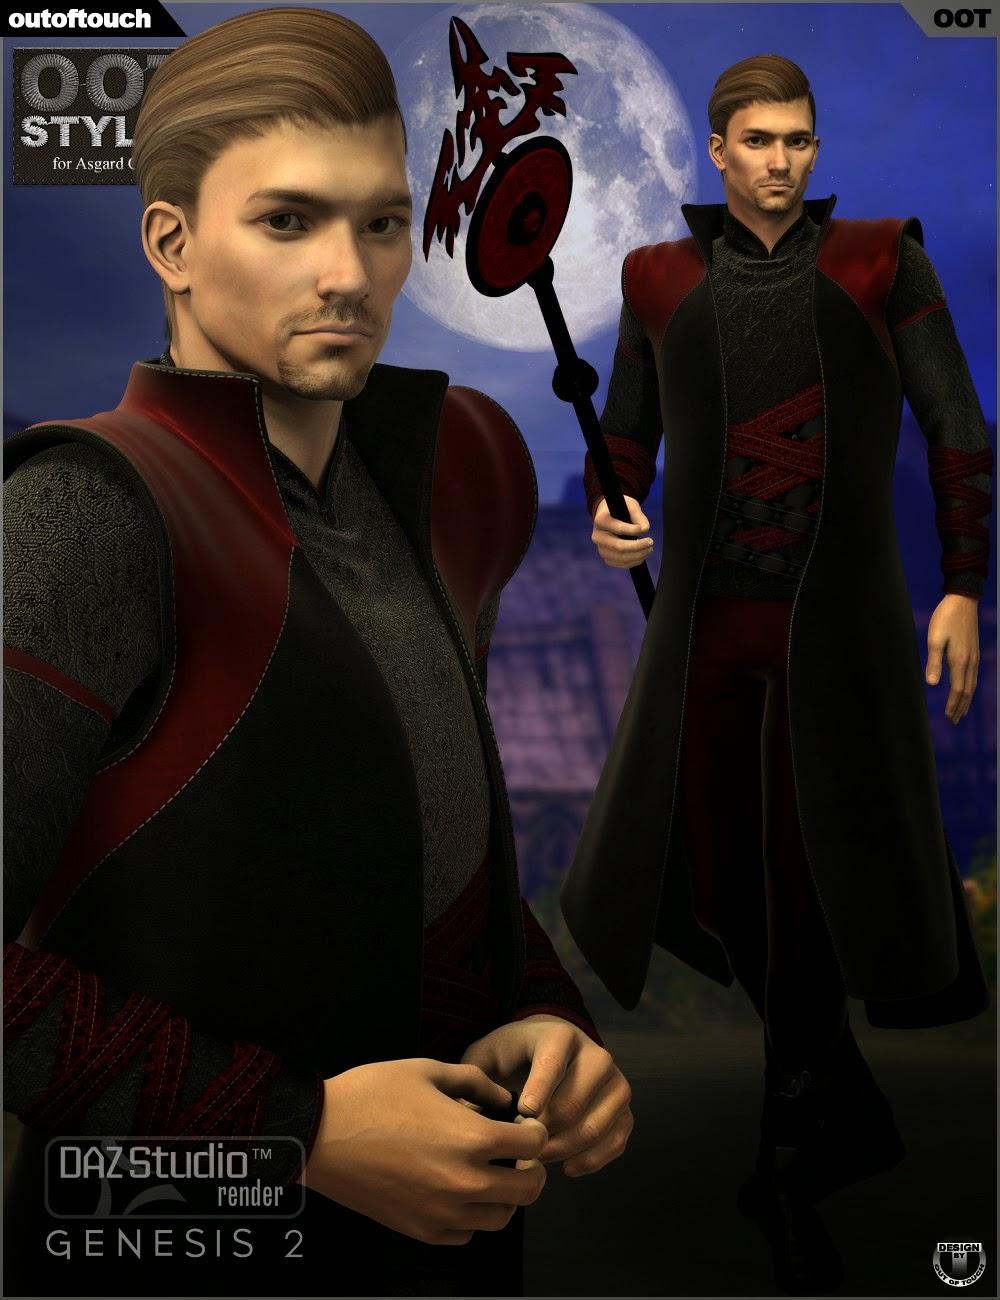 Styles de OOT pour Asgard Clerc